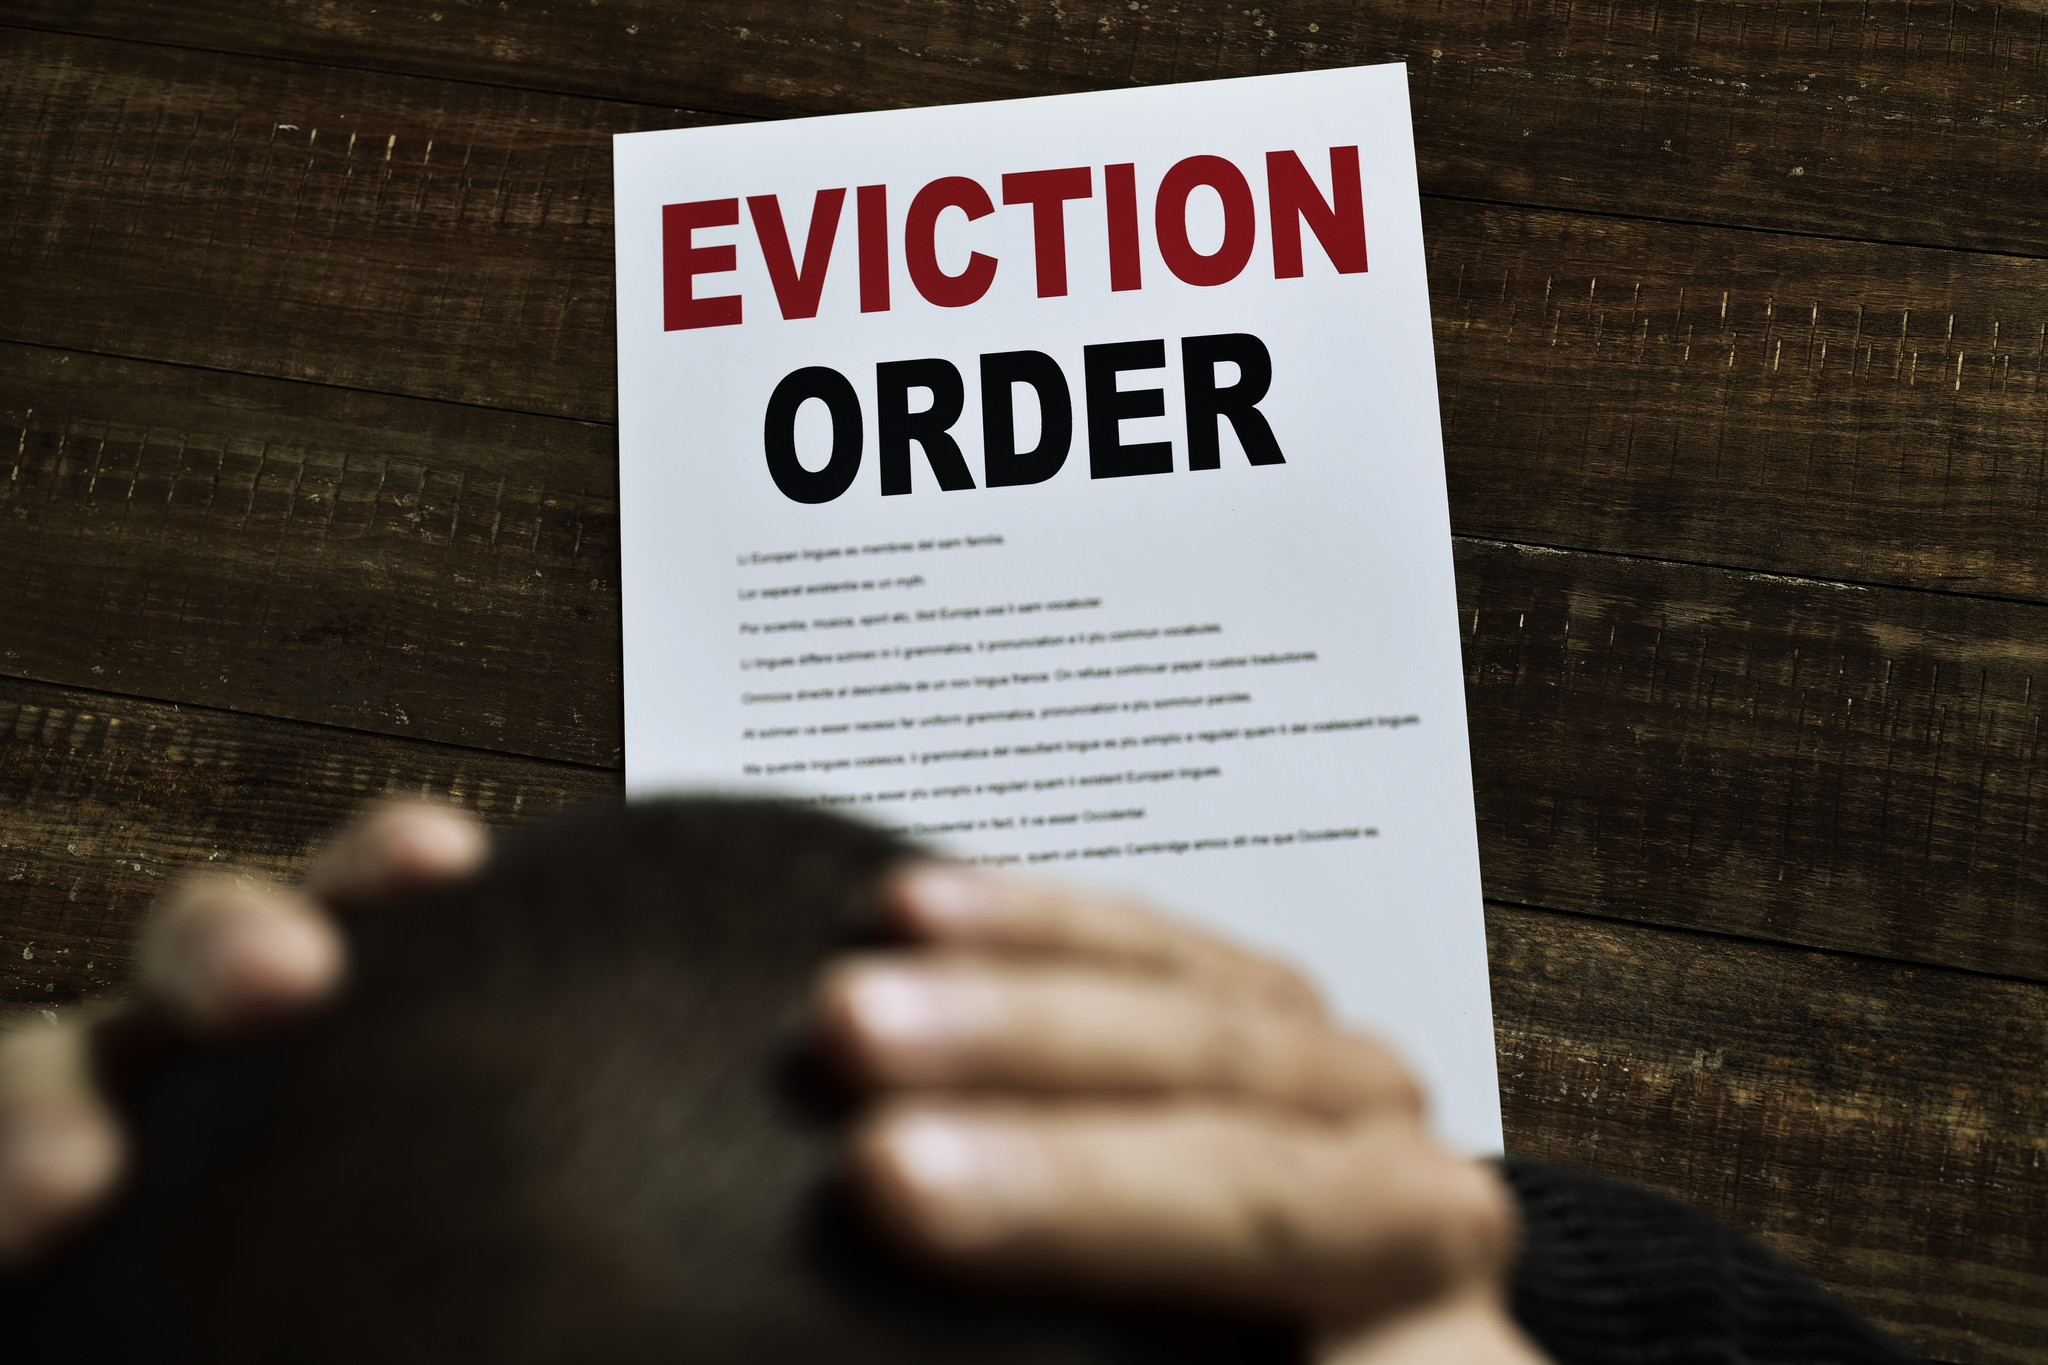 NYC renters facing hard times during coronavirus outbreak despite eviction moratorium